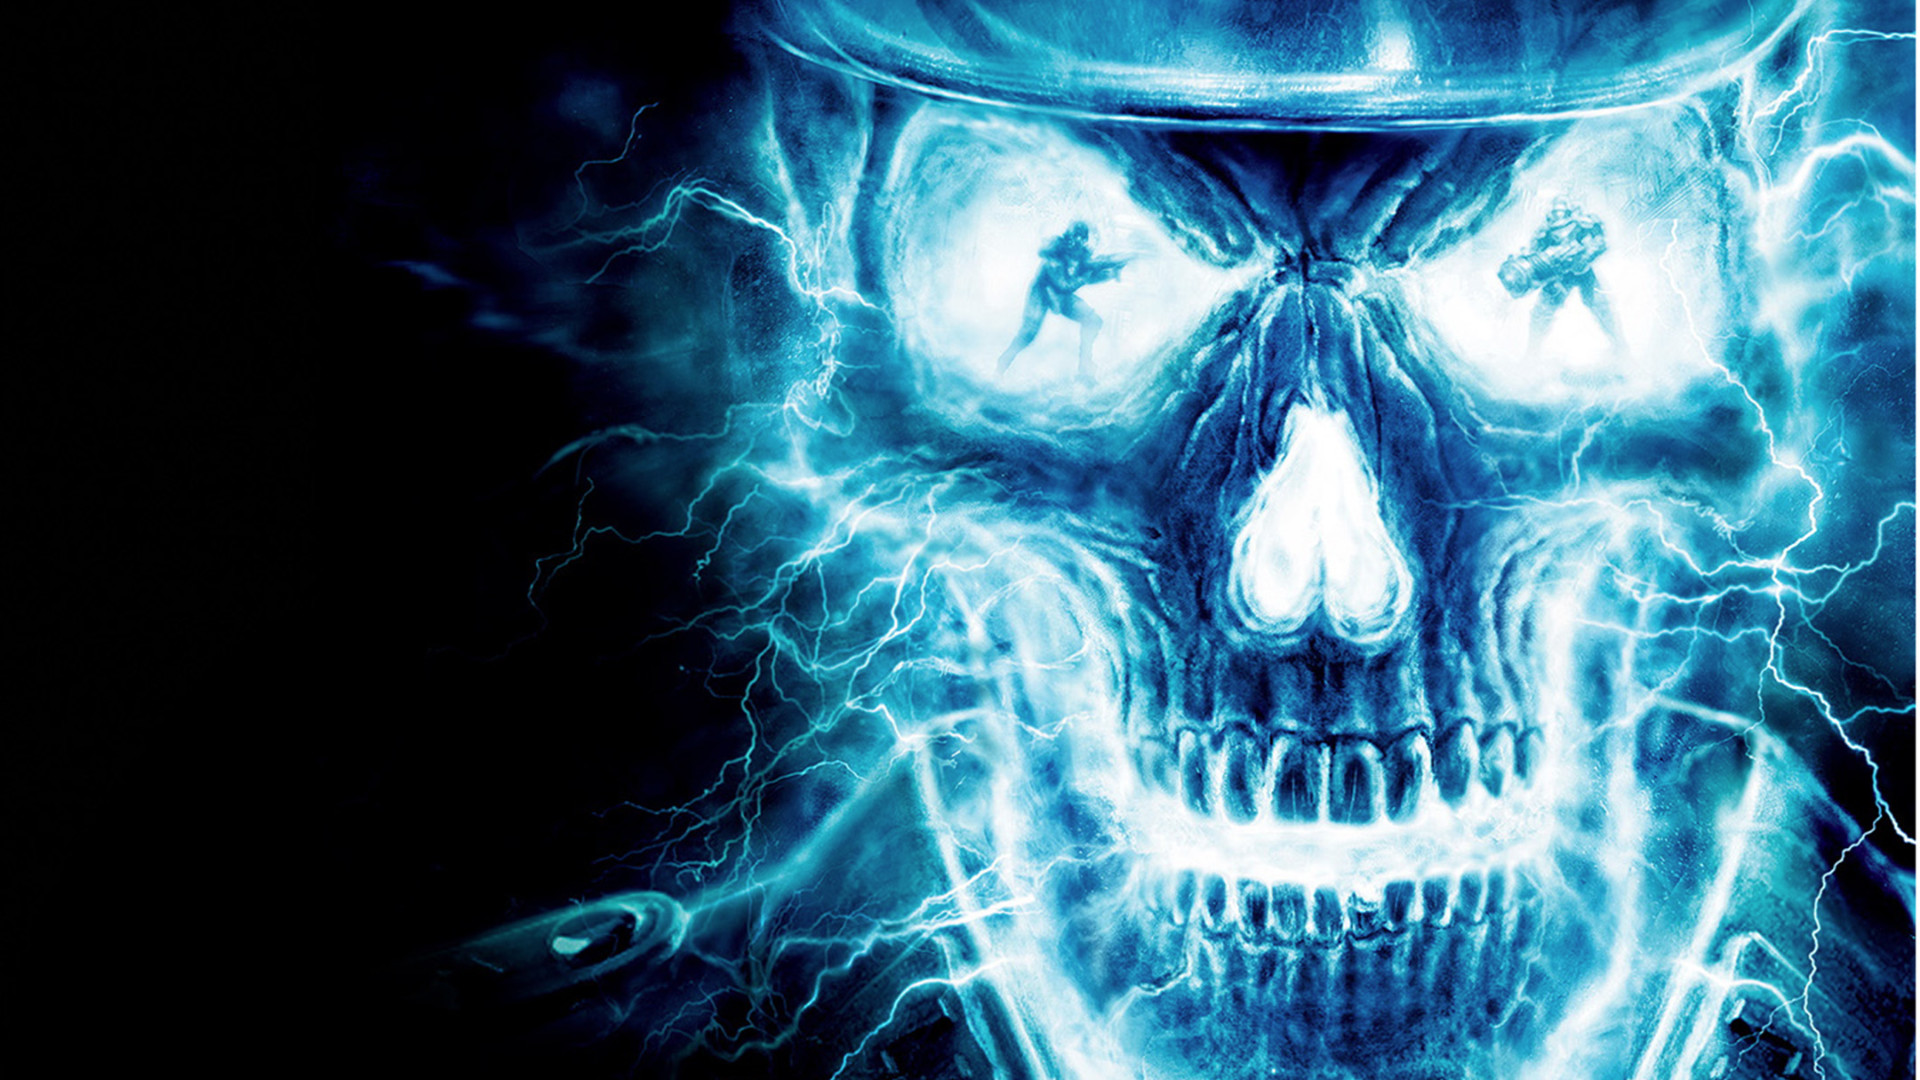 Res: 1920x1080, attractive skull danger blue light wallpaper